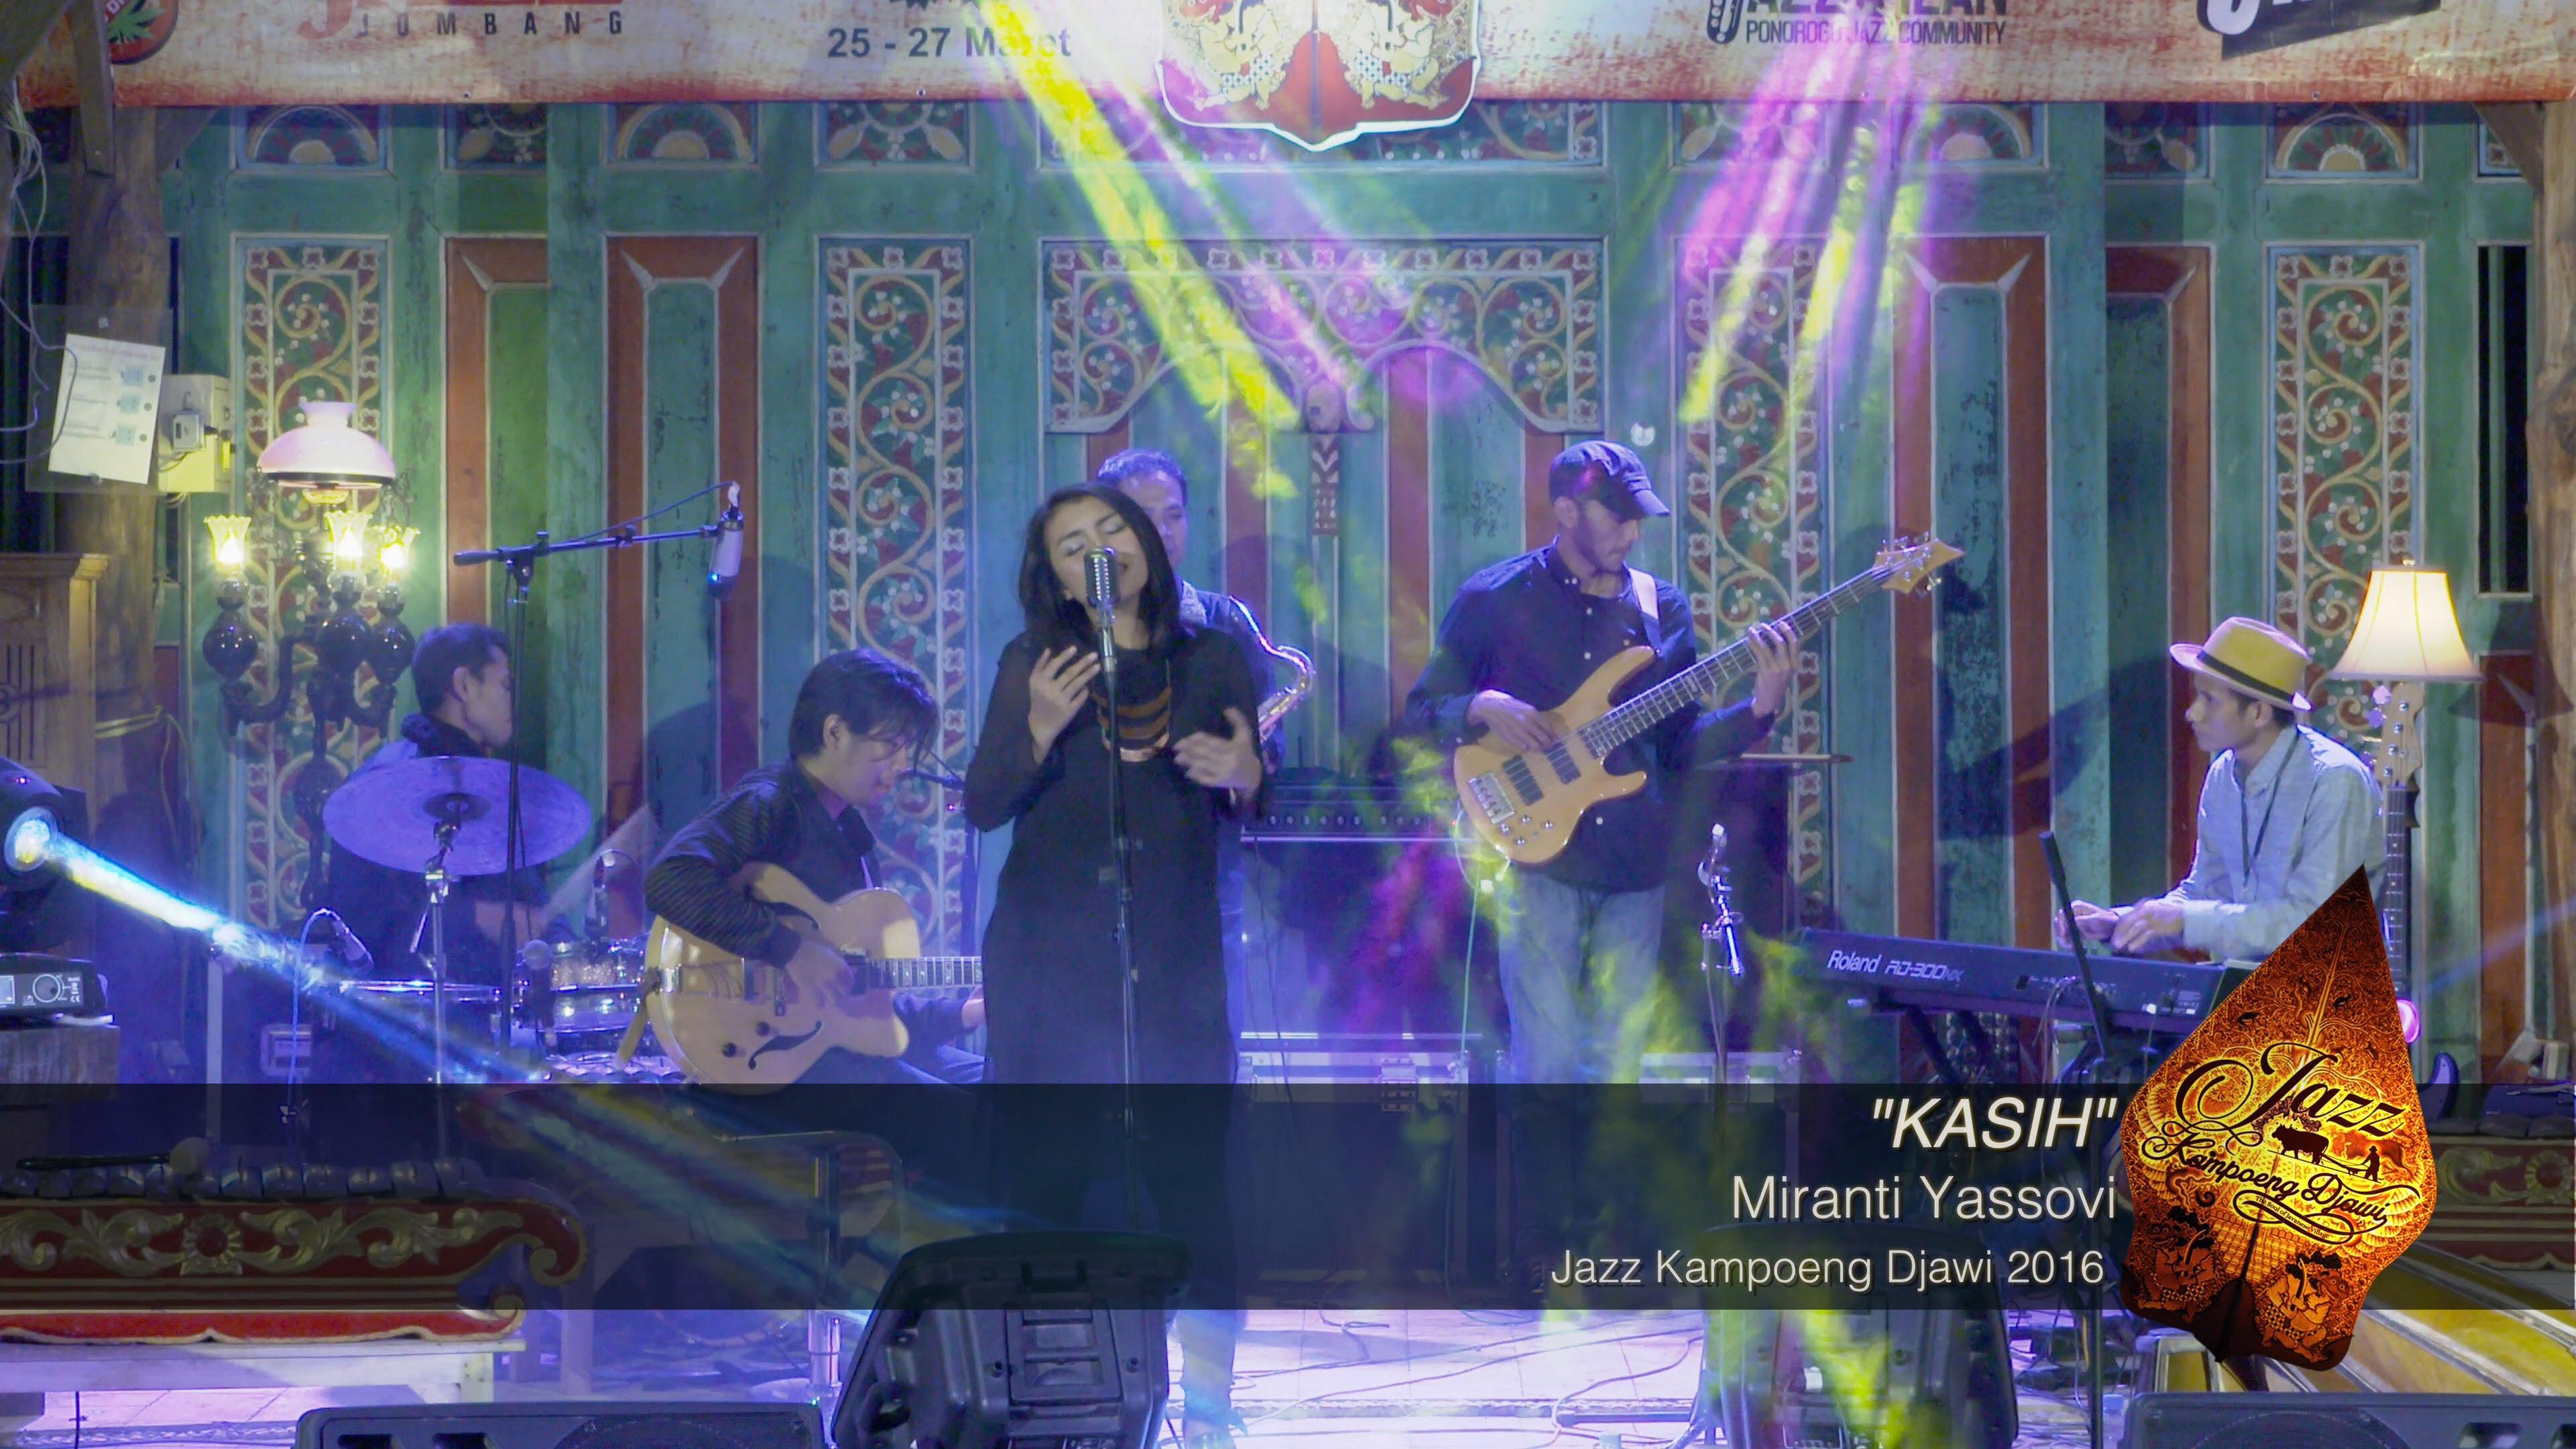 Miranti Yassovi Komunitas Jazz Jombang Kasih Kampoeng Djawi 2016 Youtube